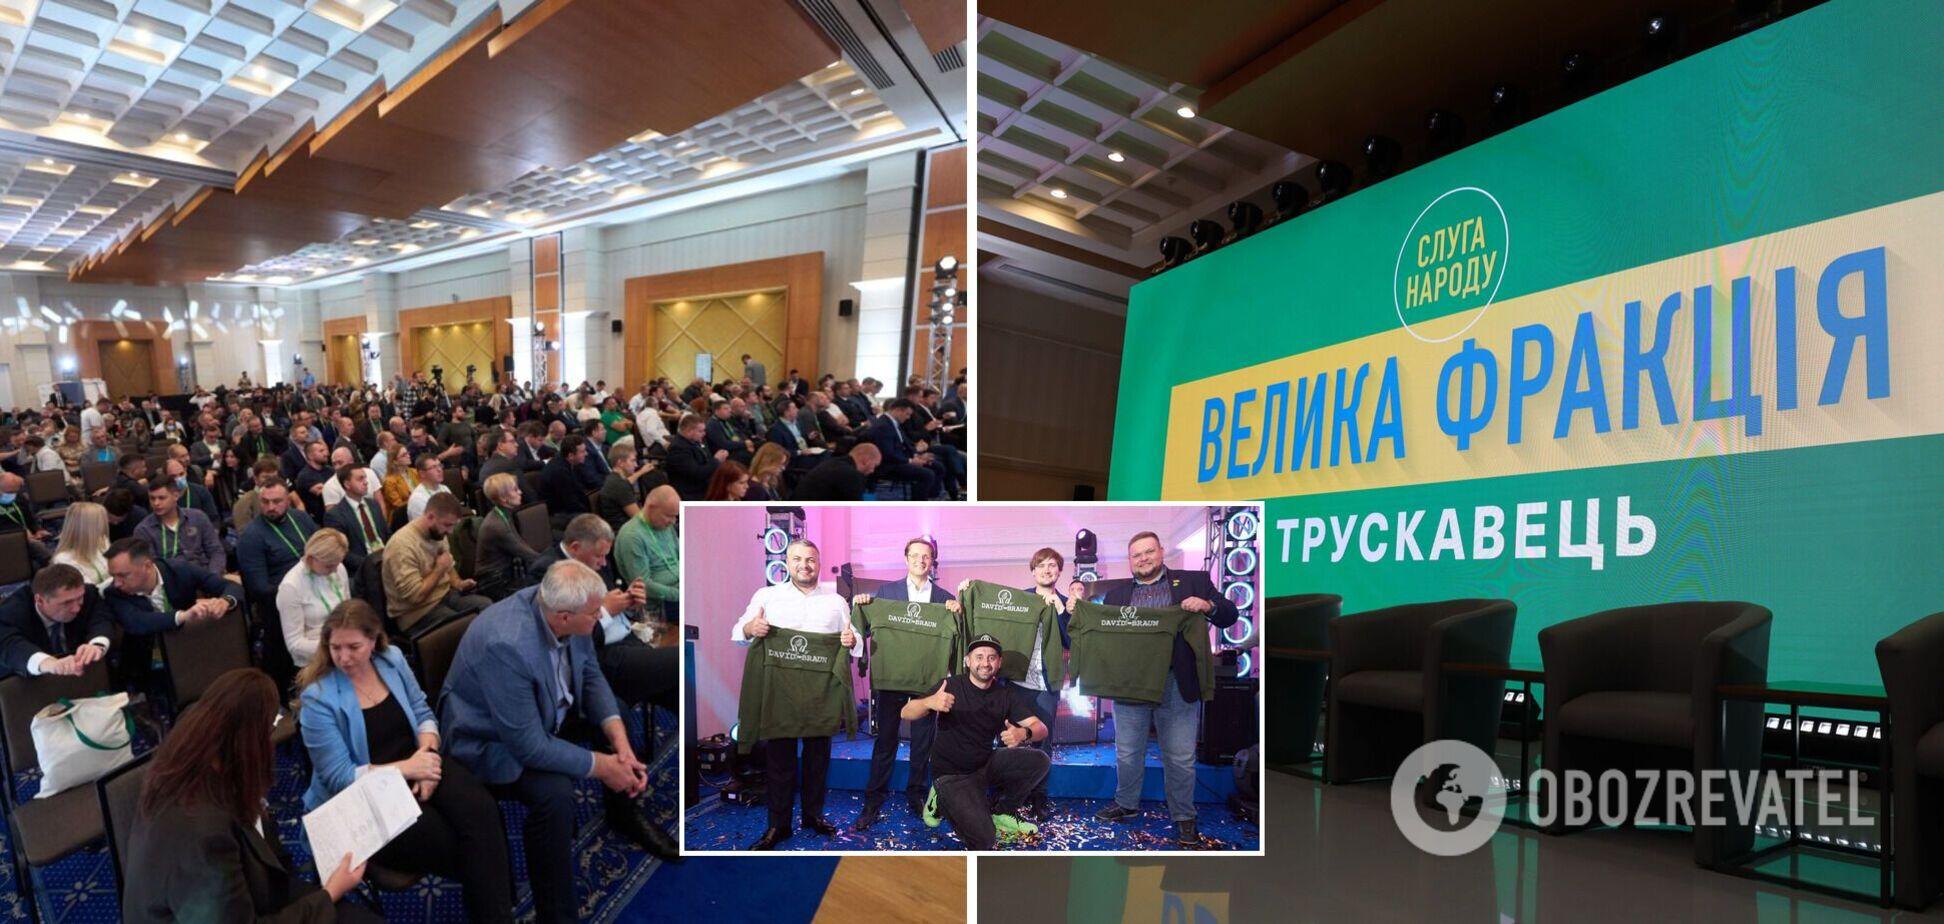 'Отец года' и 'Пчелы против меда': на съезде в Трускавце 'слугам' раздали награды. Фото и видео